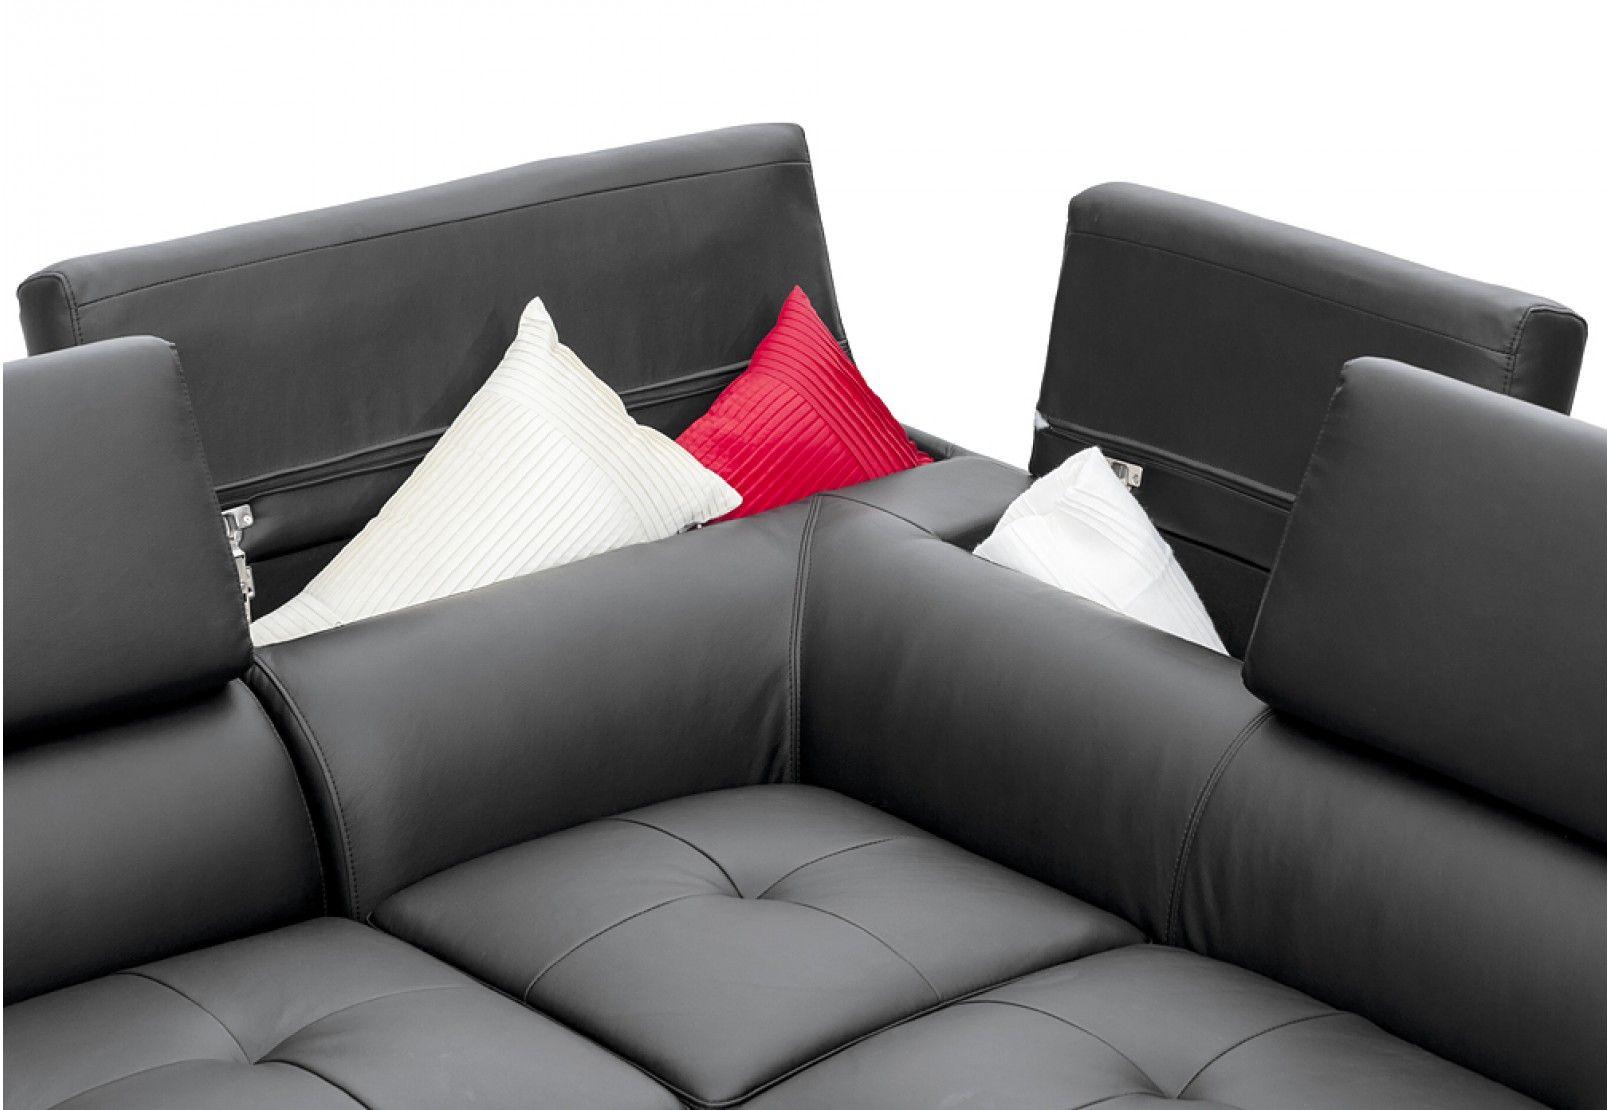 Awe Inspiring Conrad Leather Look Corner Chaise Suite Amart Furniture Ibusinesslaw Wood Chair Design Ideas Ibusinesslaworg